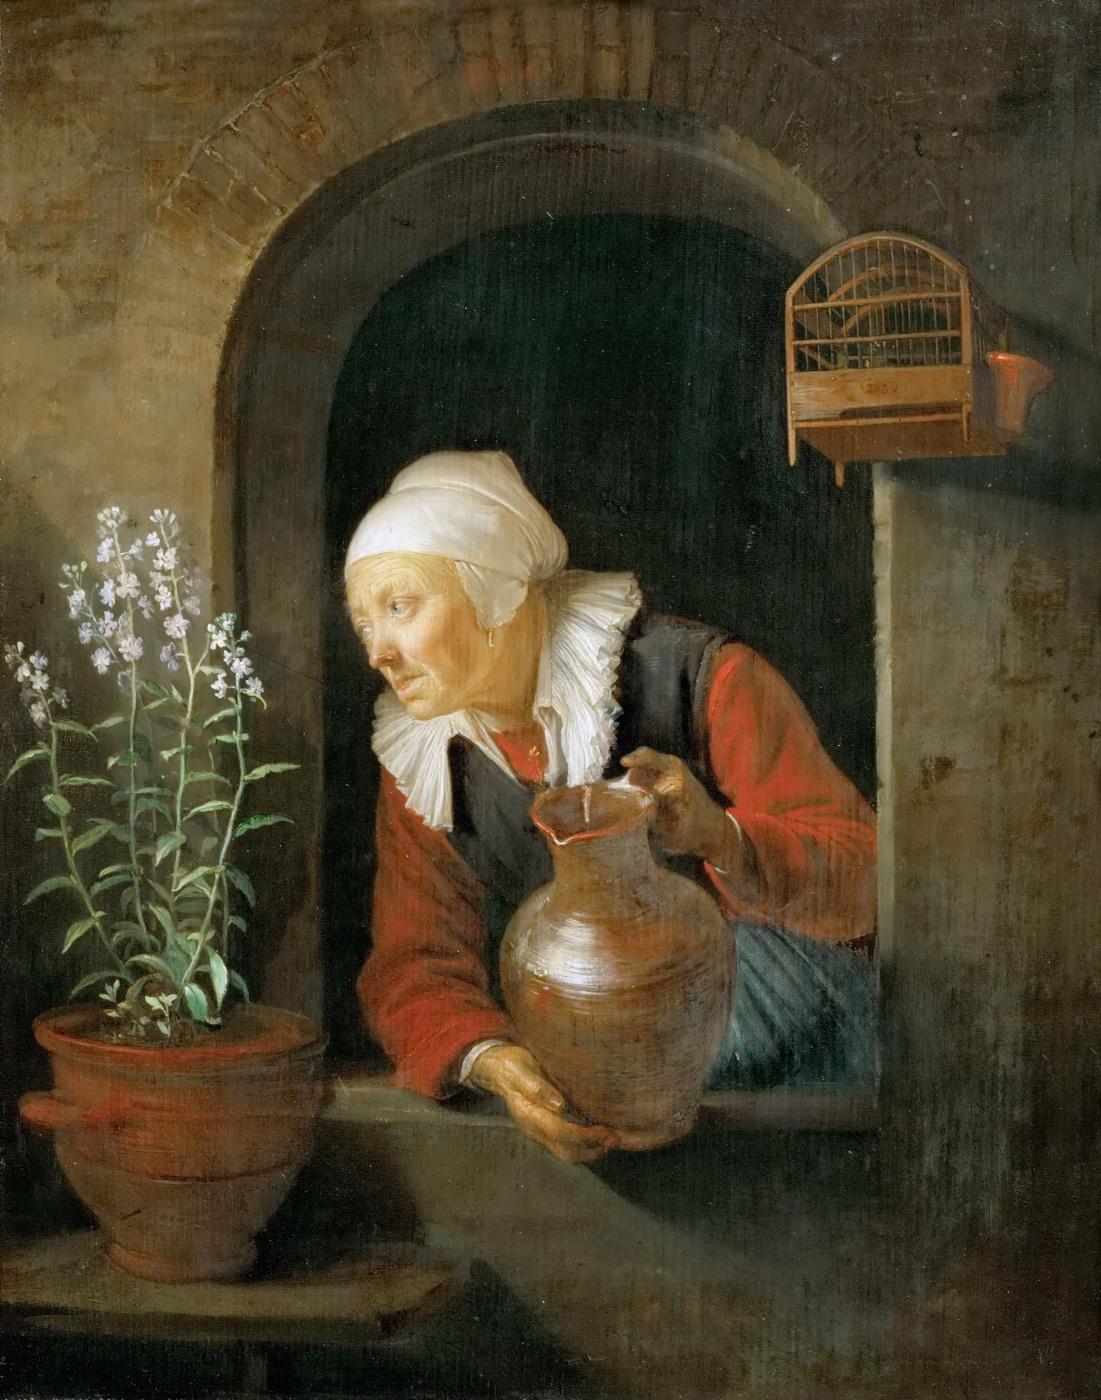 Gerrit (Gerard) Dow. The old woman in the window, watering flowers